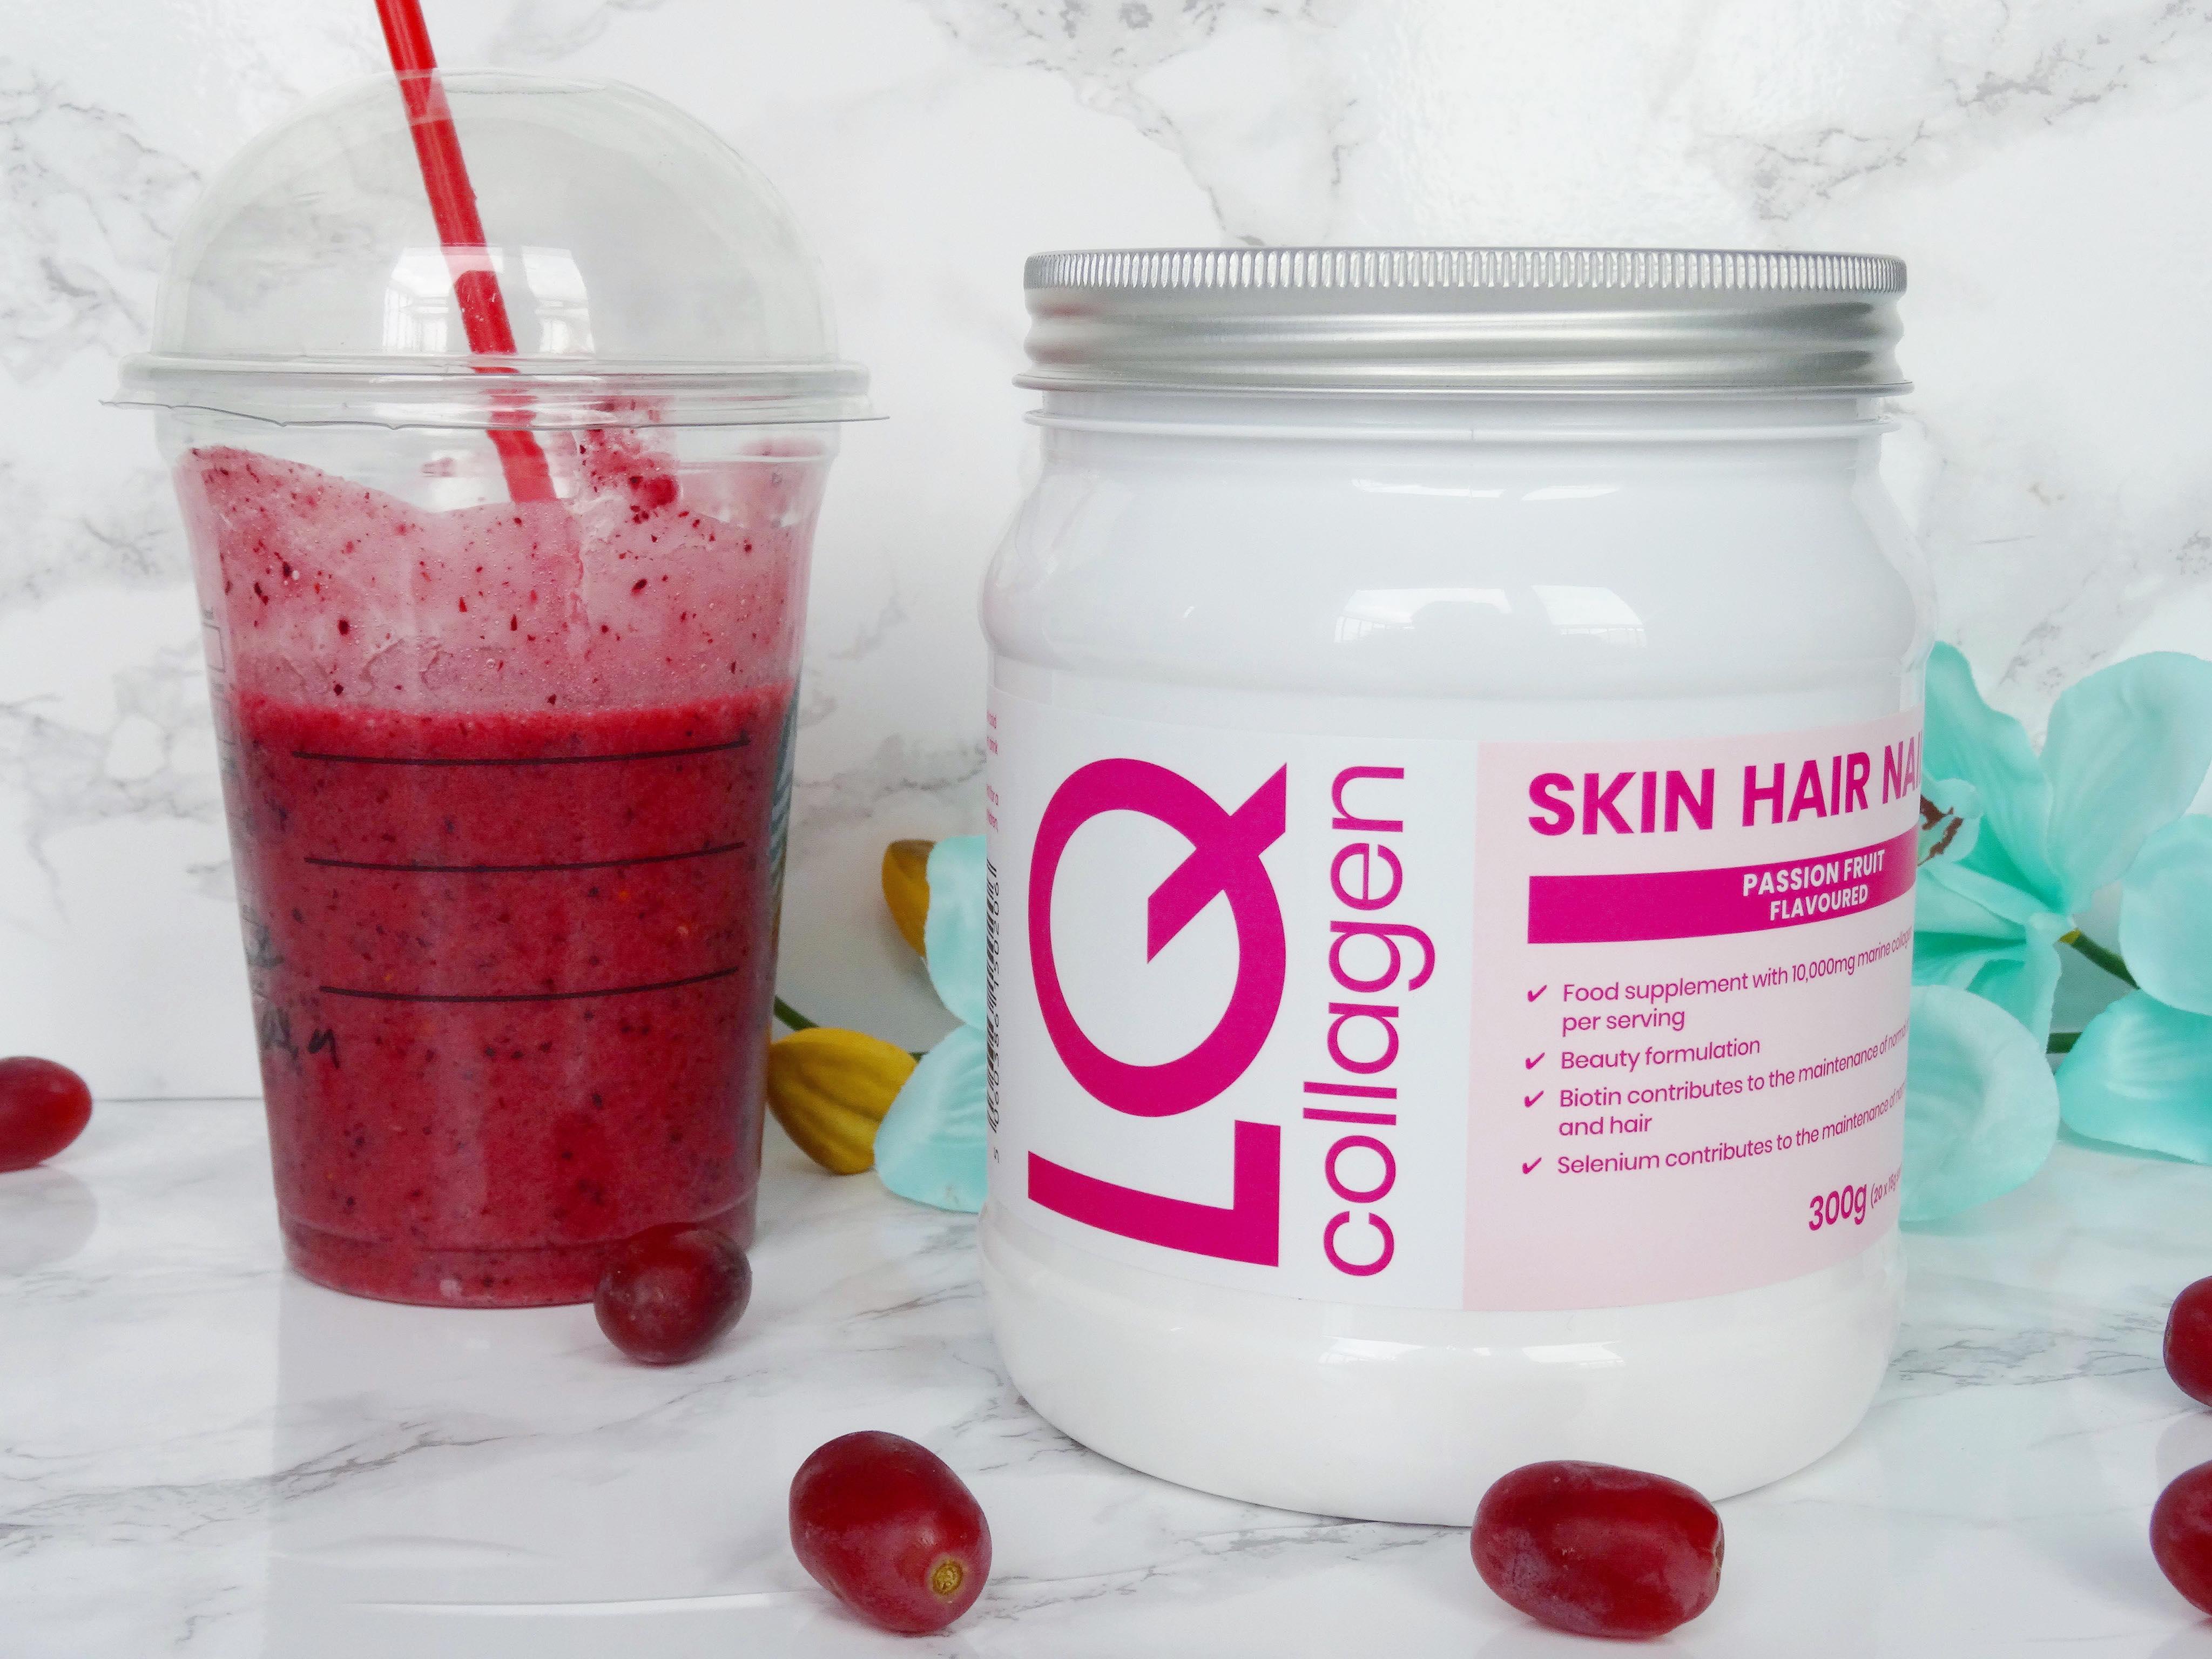 LQ Collagen Skin Hair Nails Powder